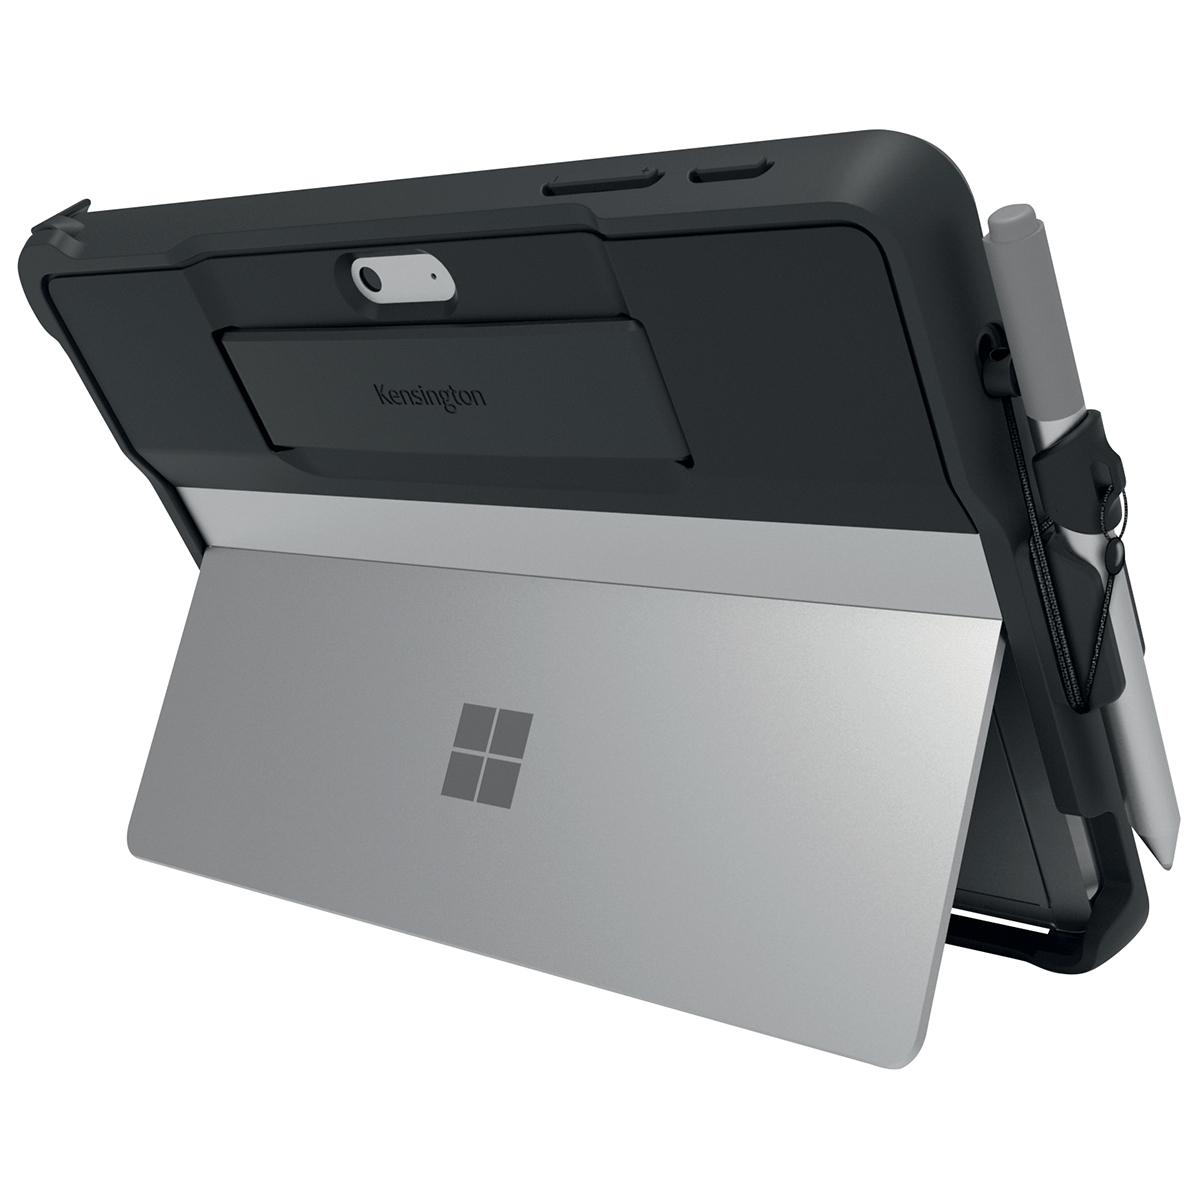 Kensington K97454EU BlackBelt Rugged Case for Surface Go and Surface Go 2